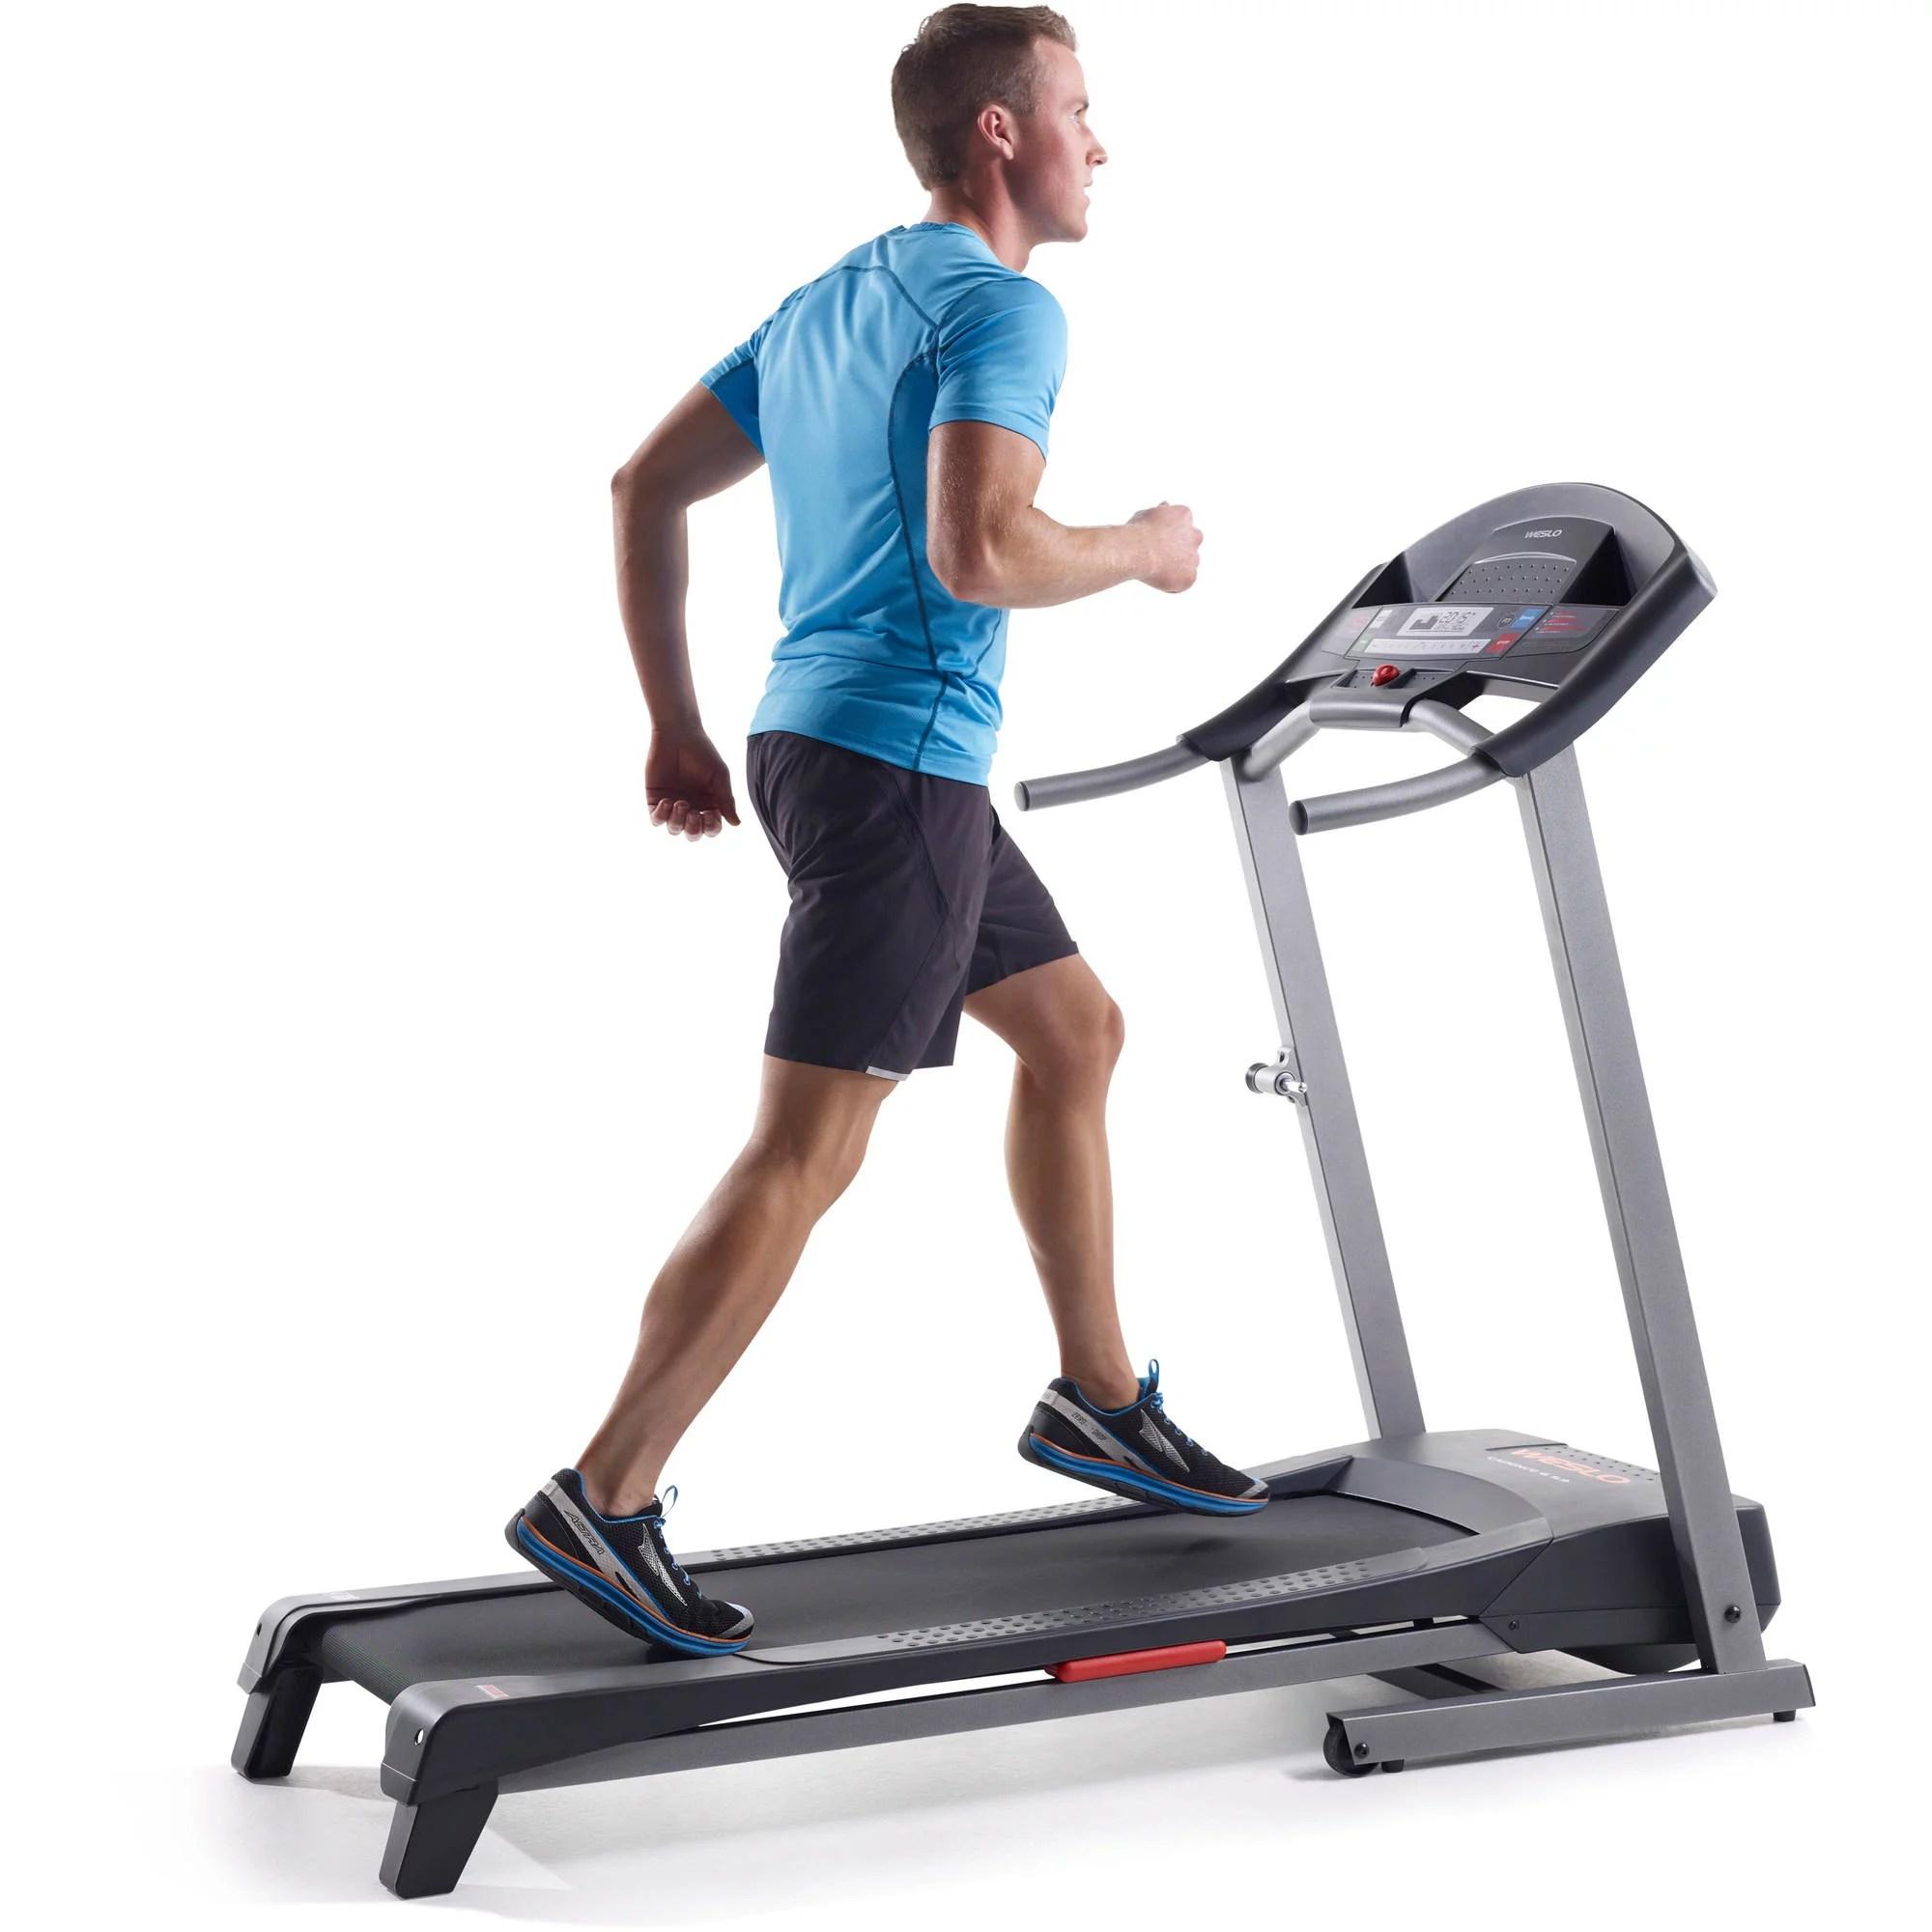 hight resolution of weslo cadence g 5 9i folding treadmill walmart com dc motor controller scr diagram permanent magnet electric treadmill motor wiring diagram